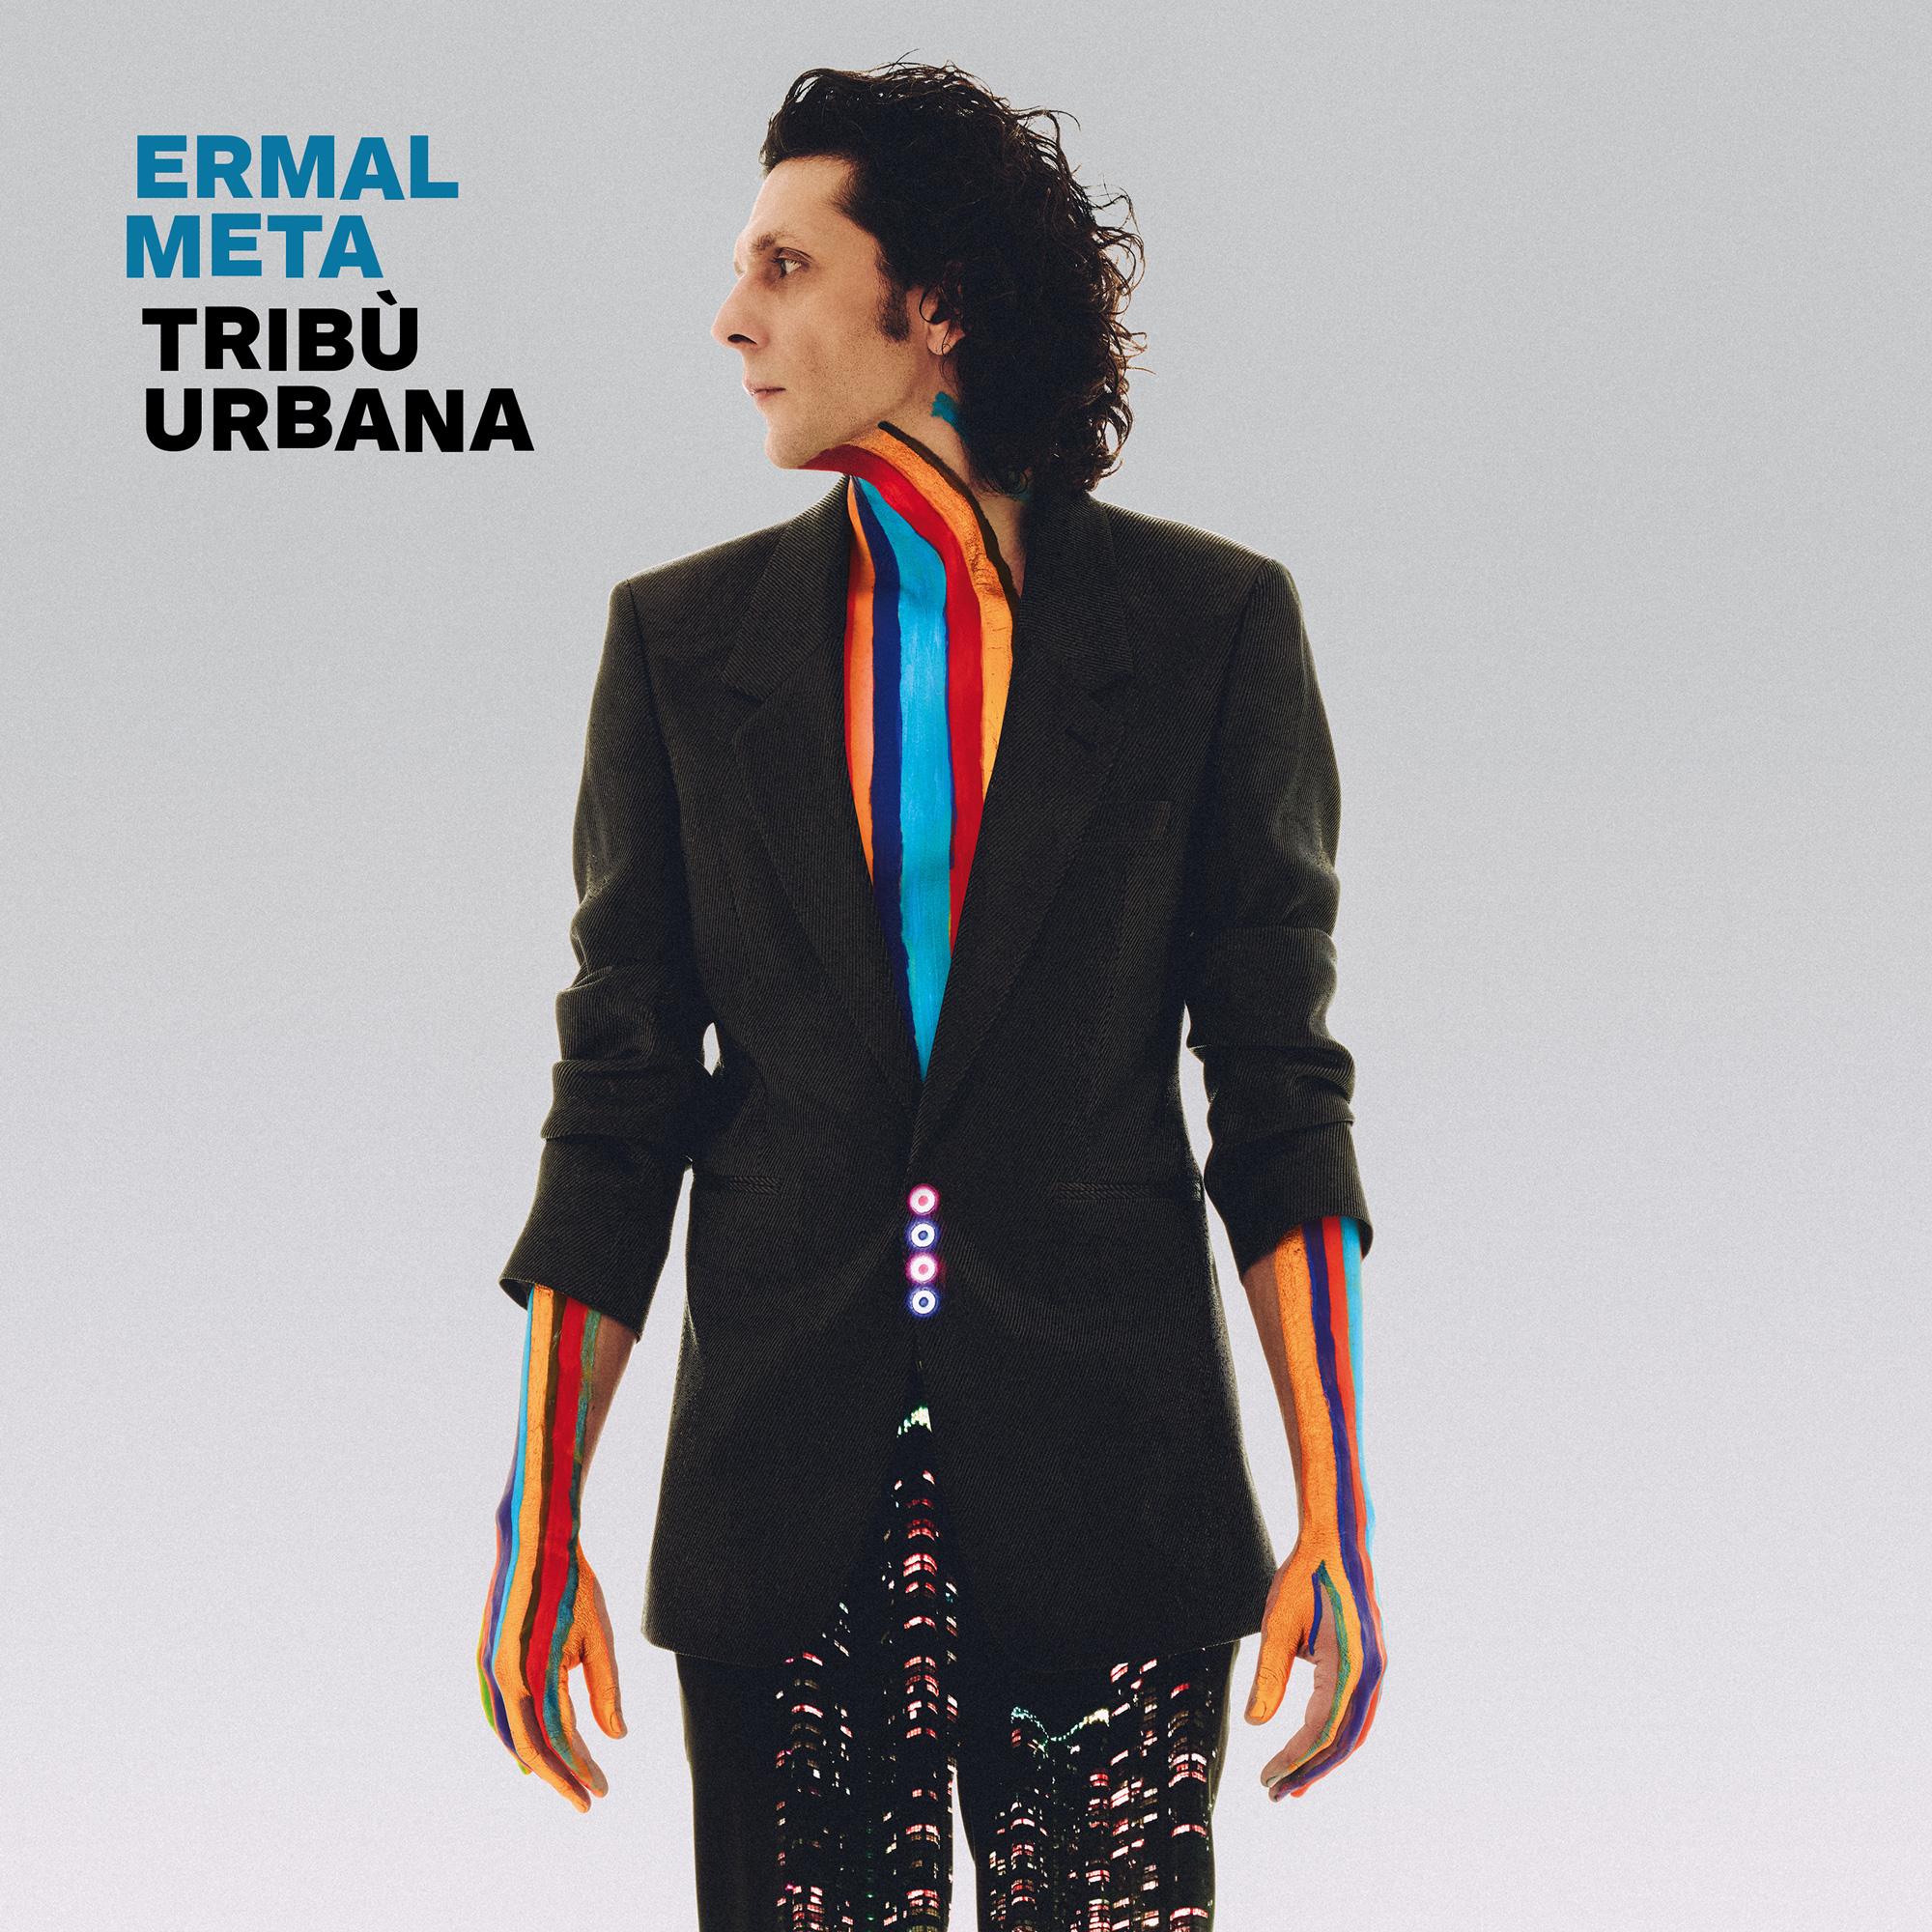 Ermal Meta Tribù Urbana cover